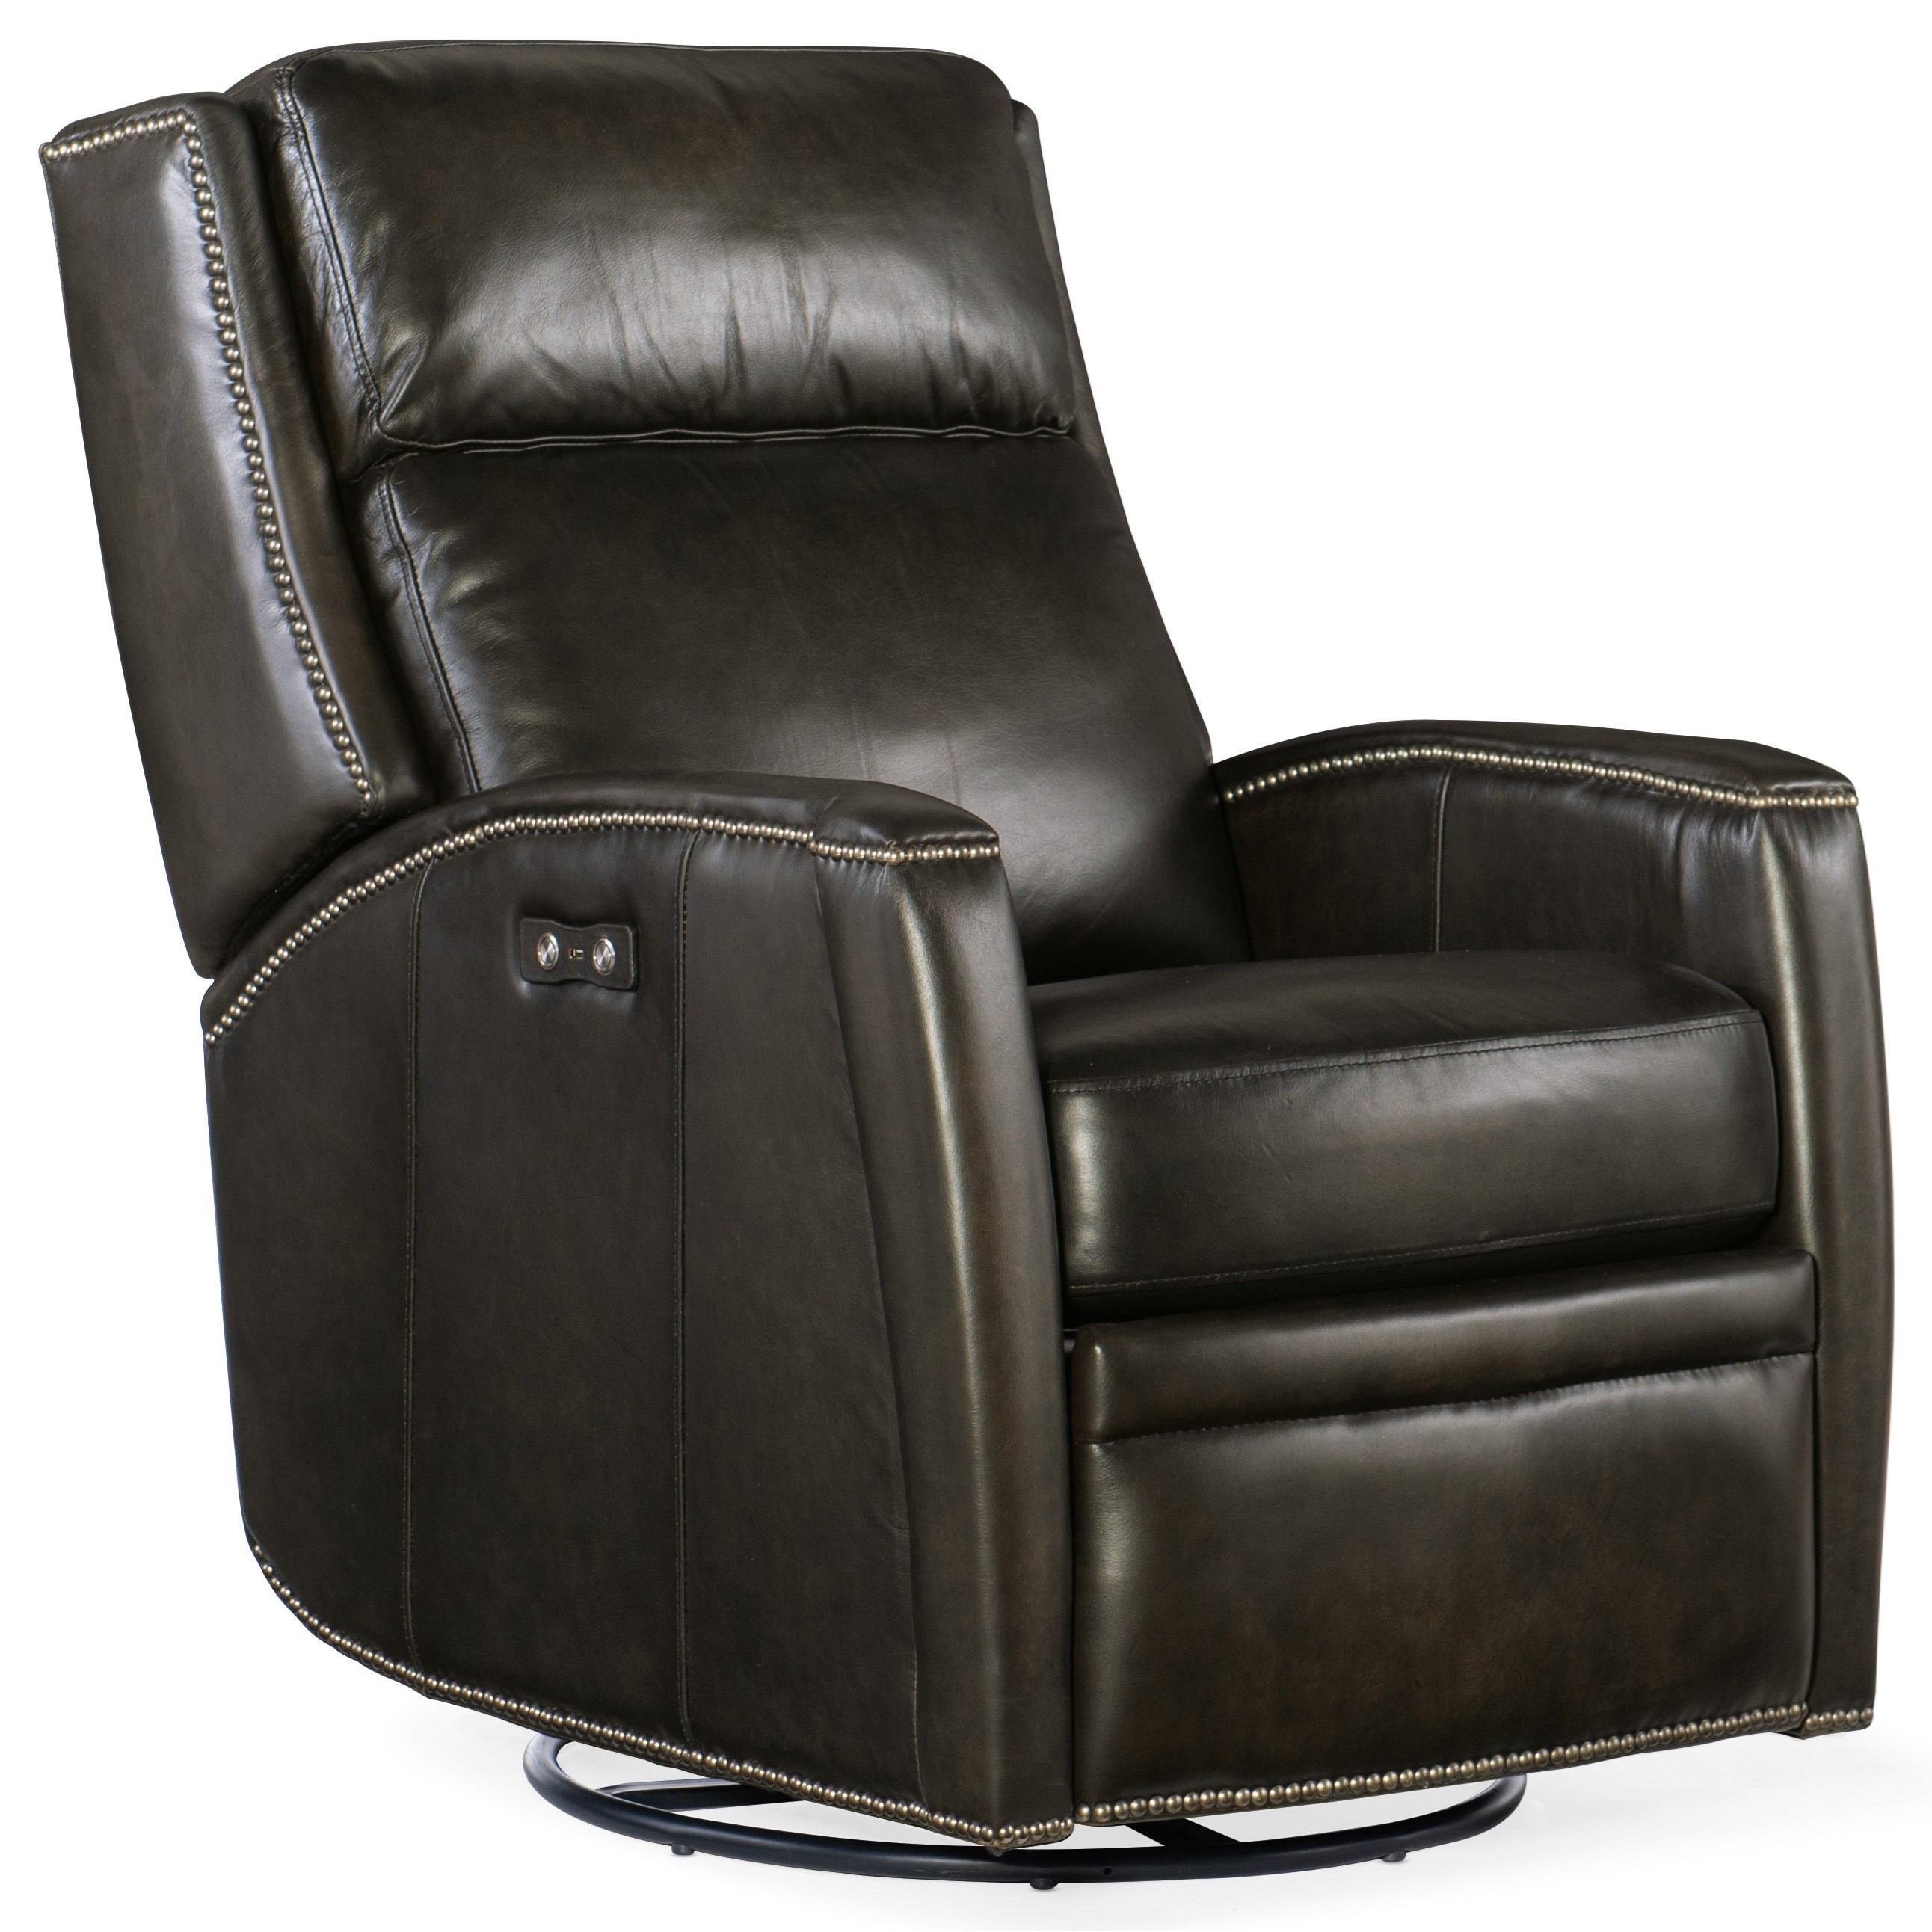 Declan Power Swivel Glider Recliner by Hooker Furniture at Baer's Furniture